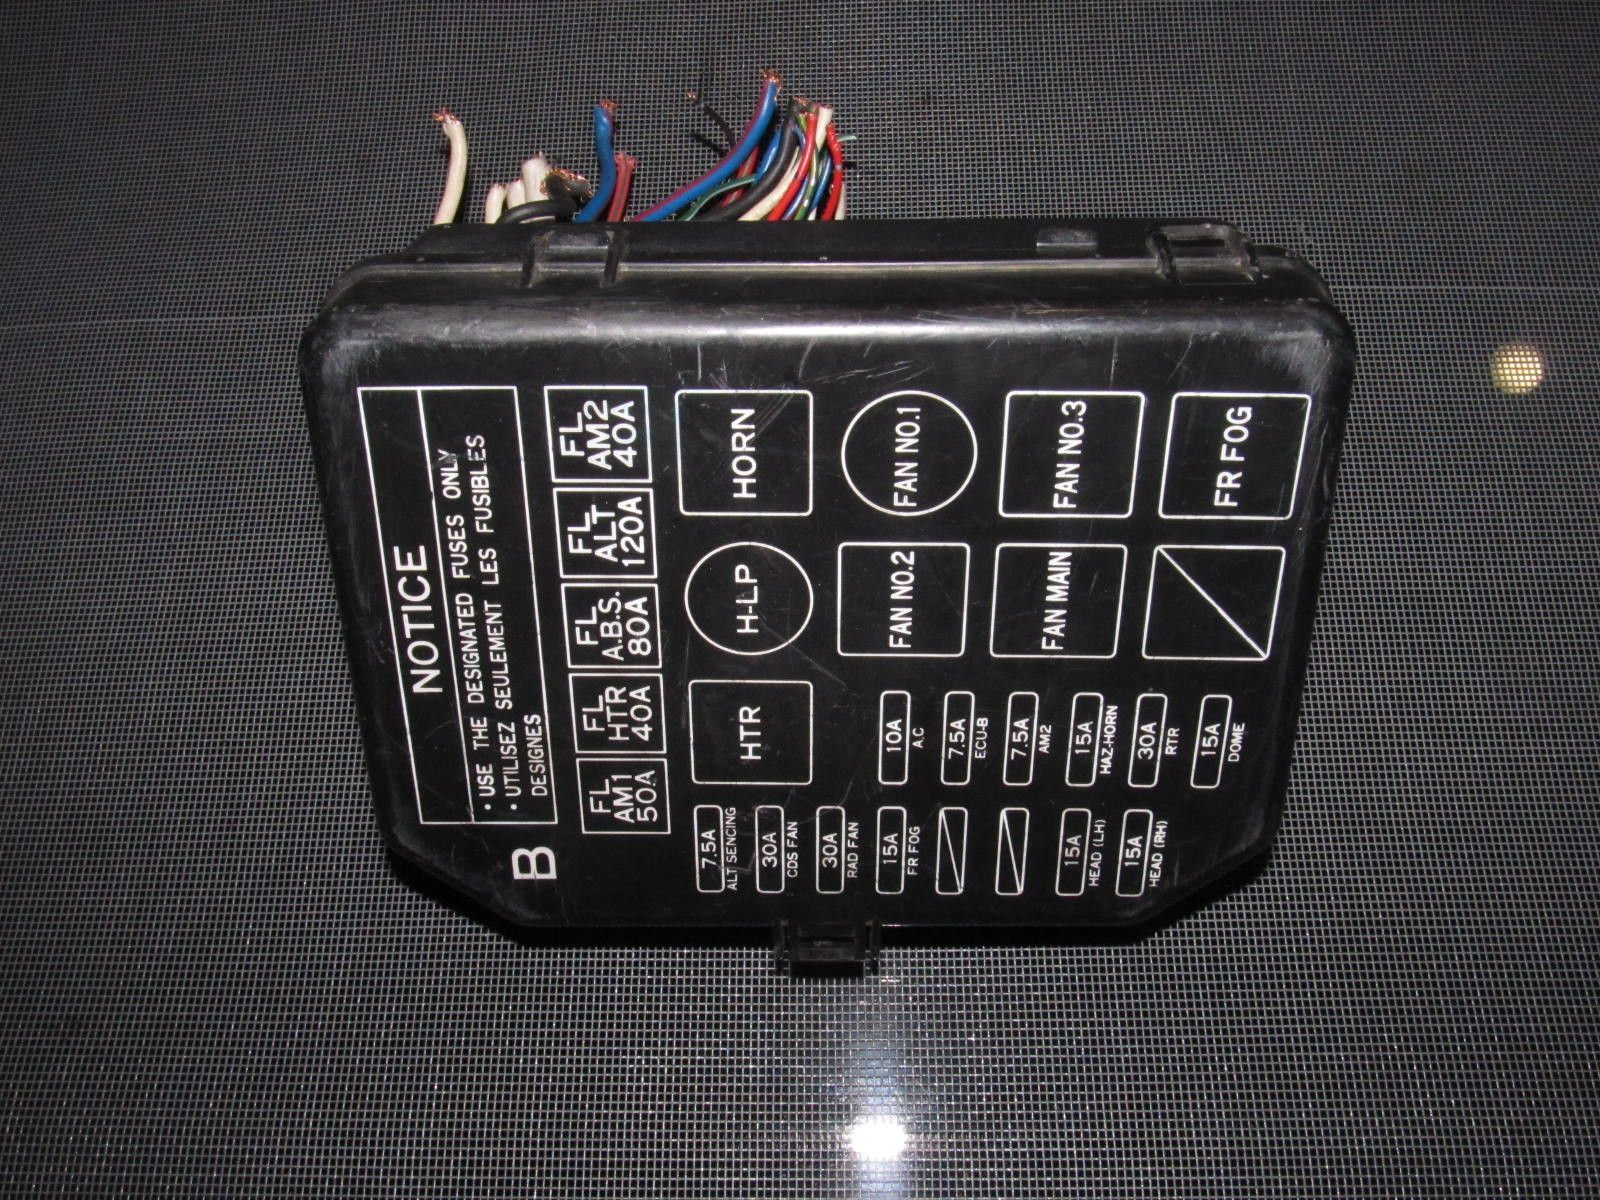 91 95 toyota mr2 oem interior fuse box products toyota mr2 and 91 95 toyota mr2 oem interior fuse box